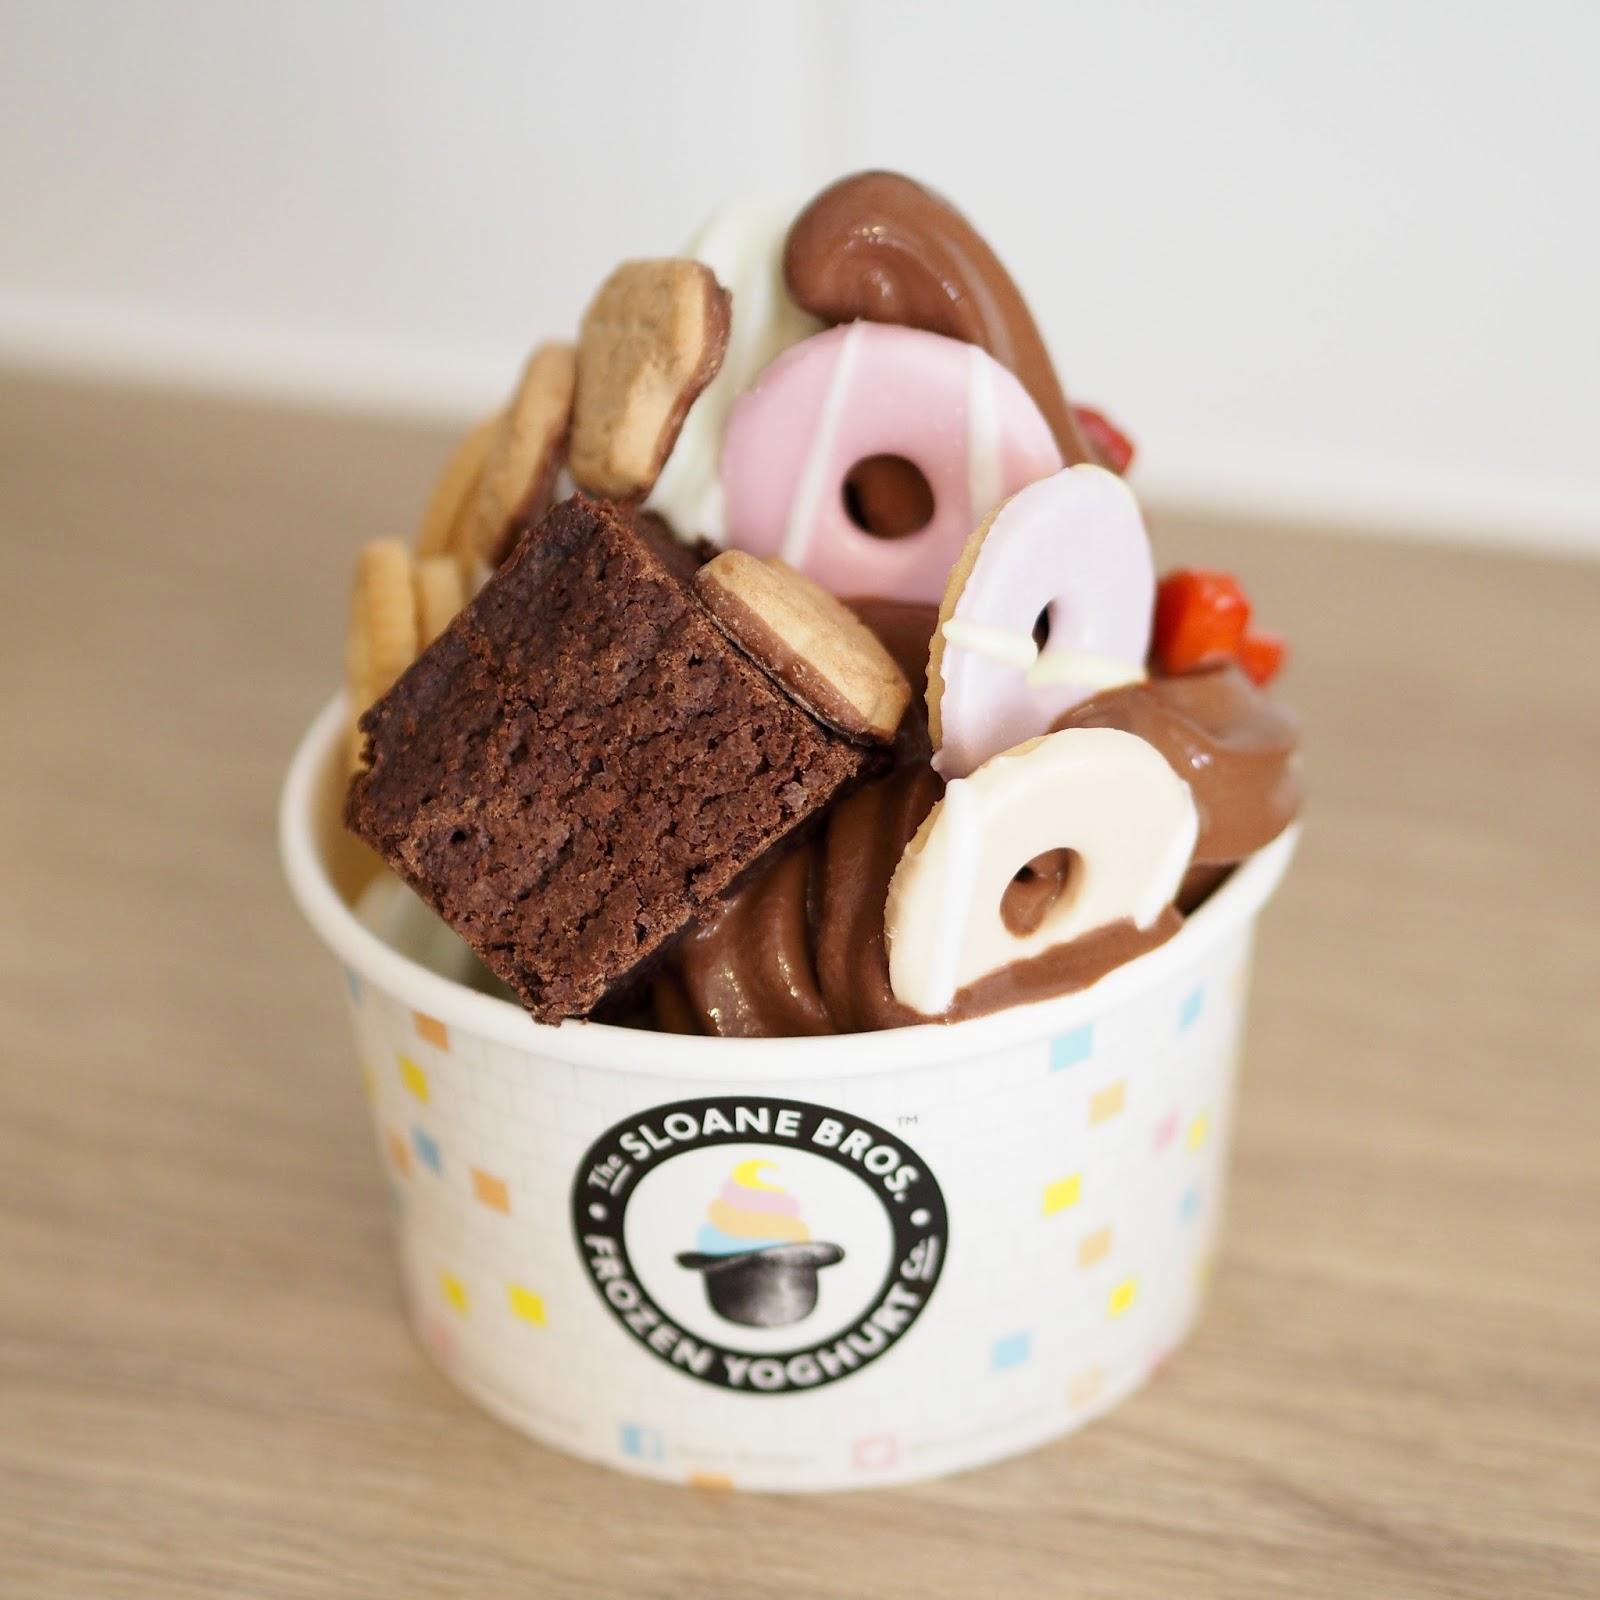 Frozen Yogurt Sloane Brothers Cocoa Chelsea